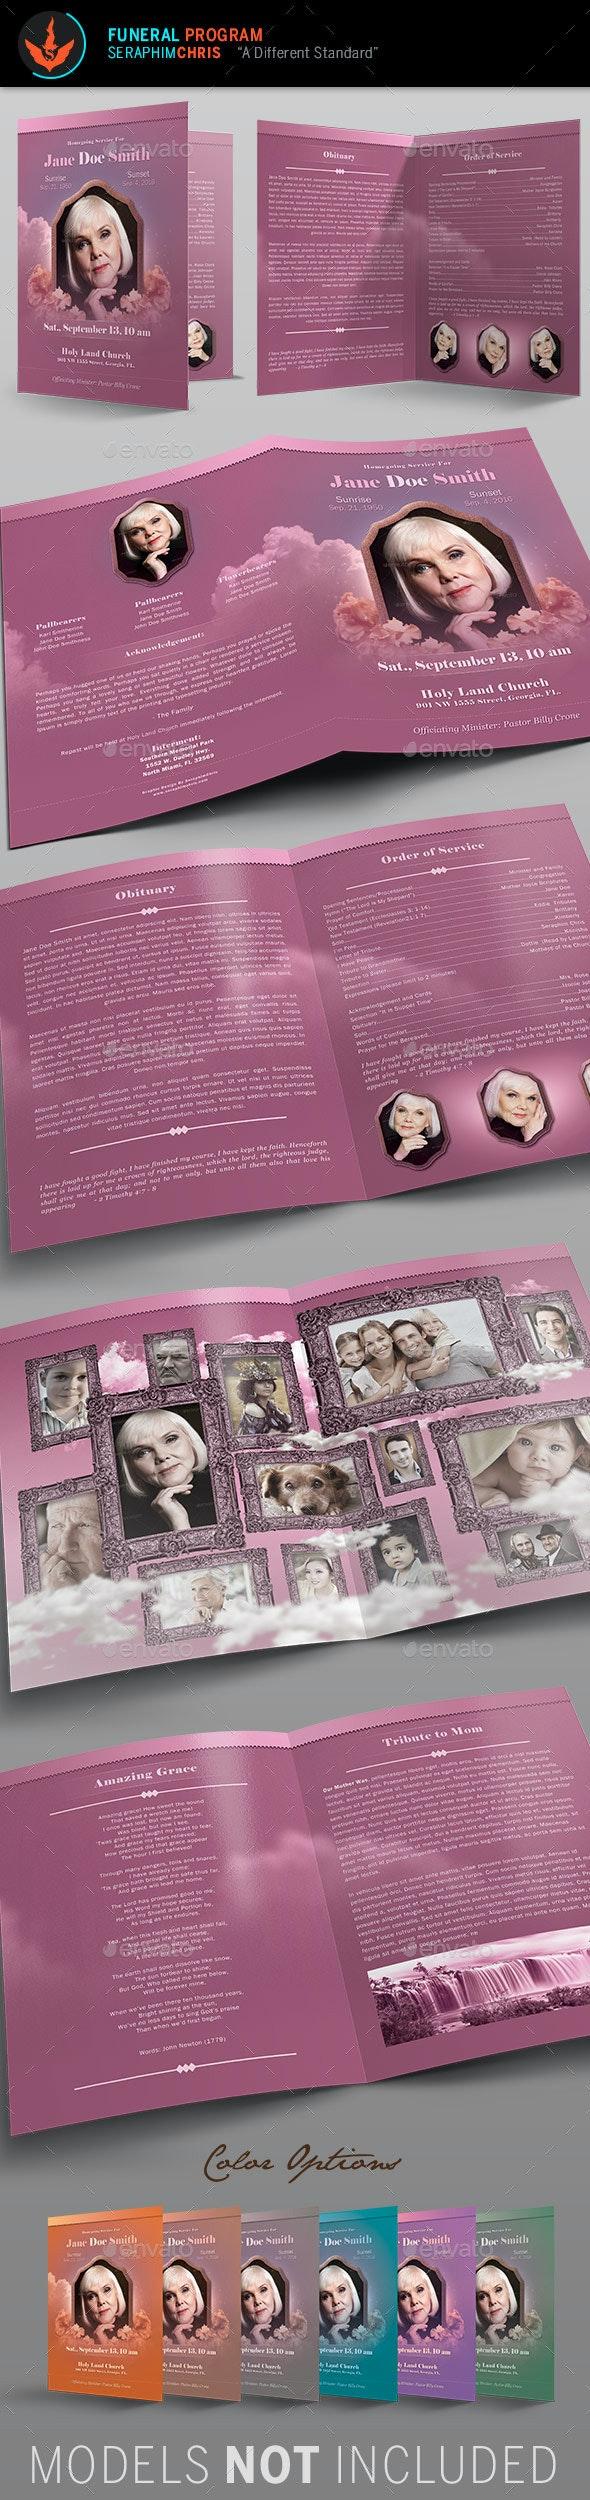 Funeral Program Full Page Bi-Fold Template - Informational Brochures